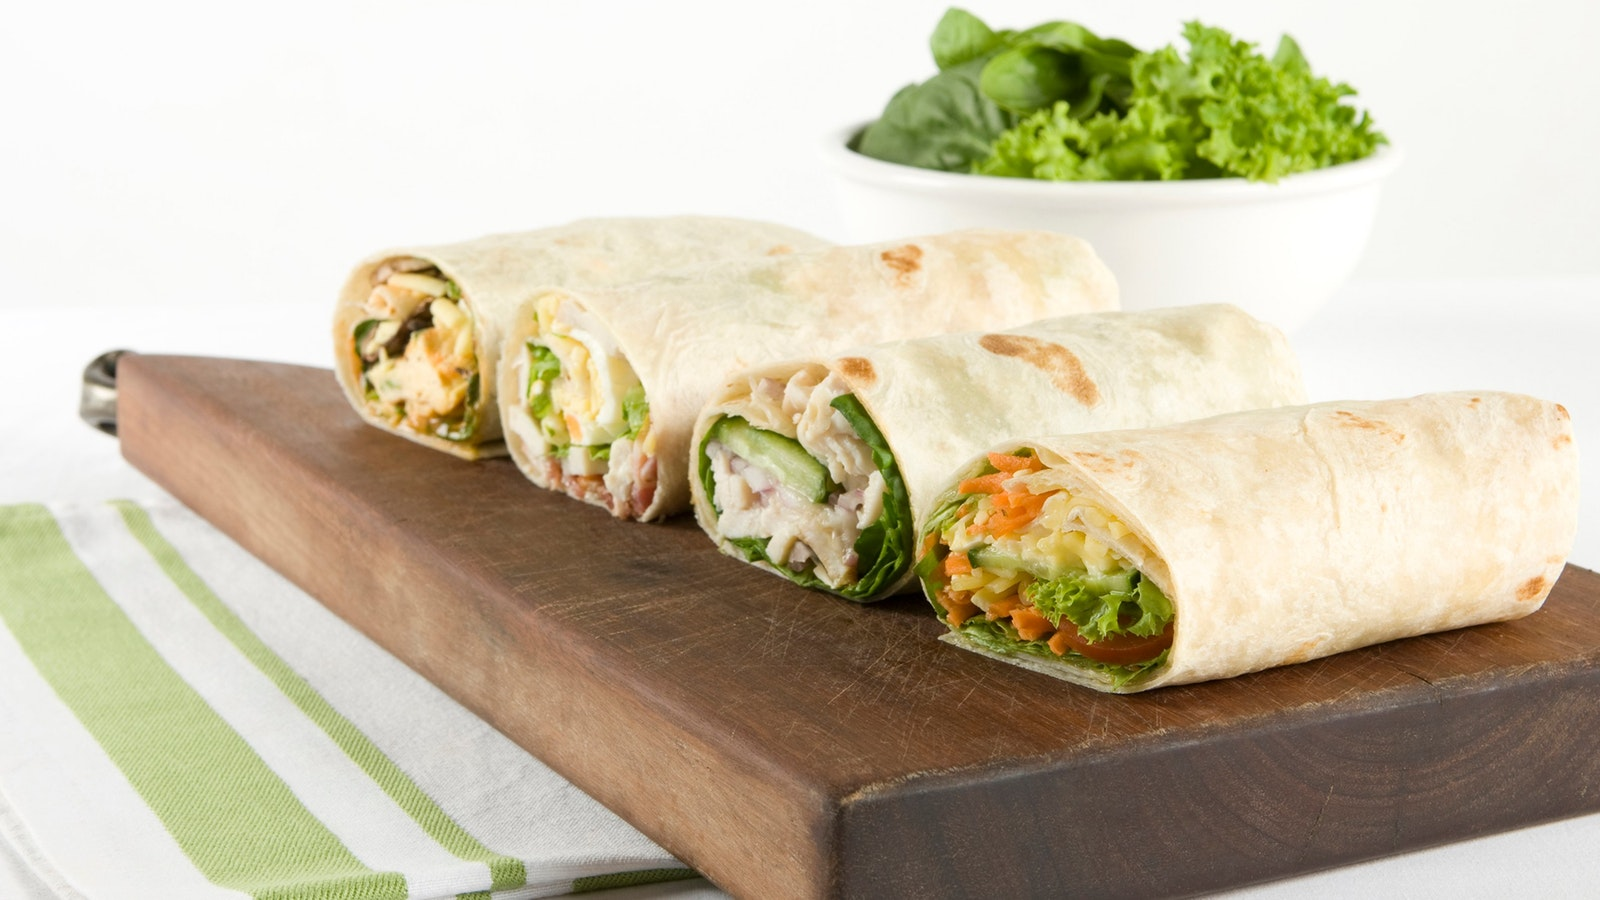 Freshly made wraps, rolls, sanwiches & Focaccias